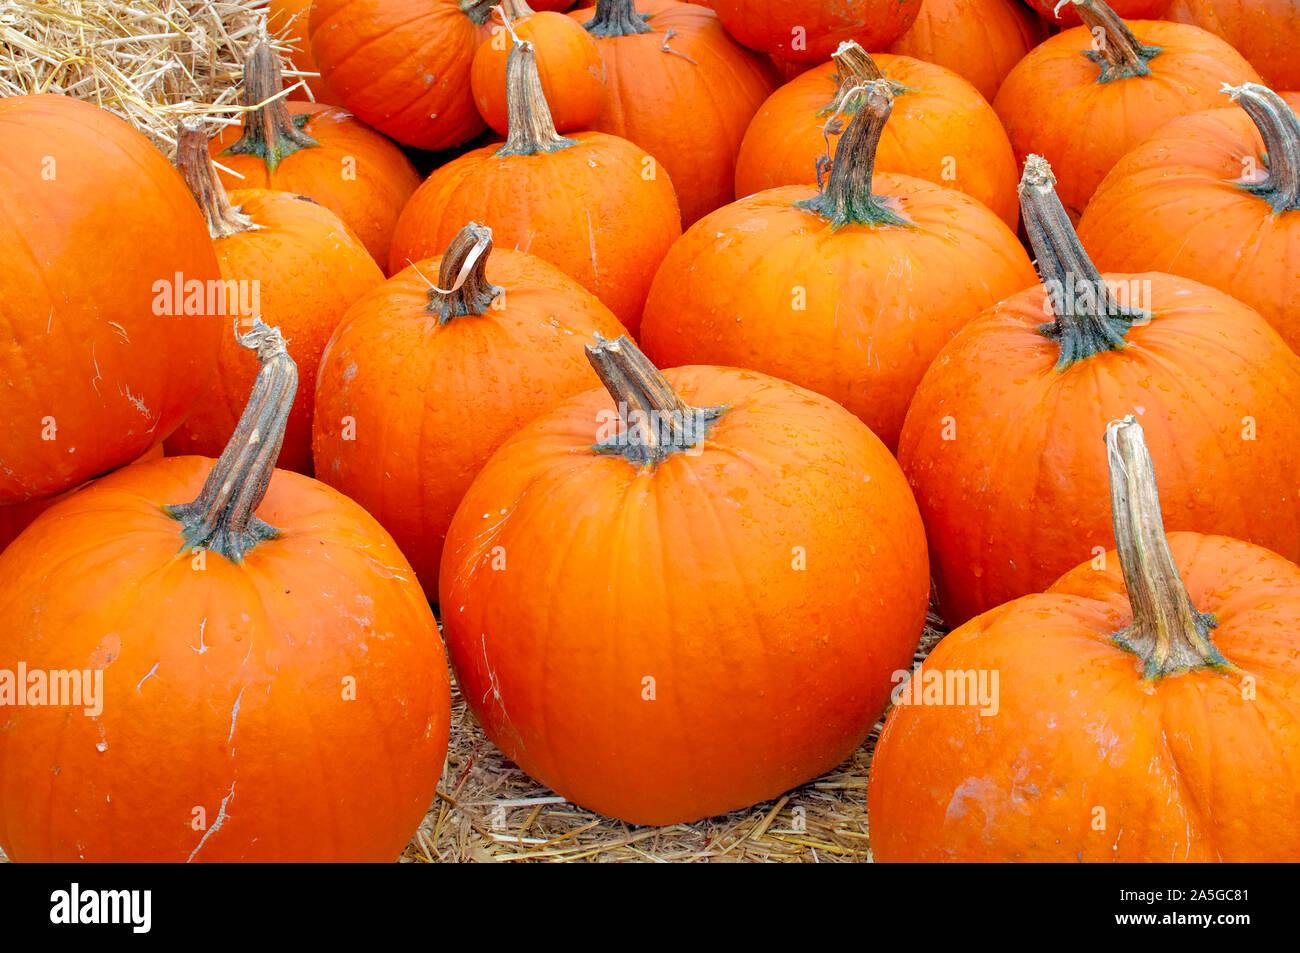 pumpkins-on-display-2A5GC81.jpg